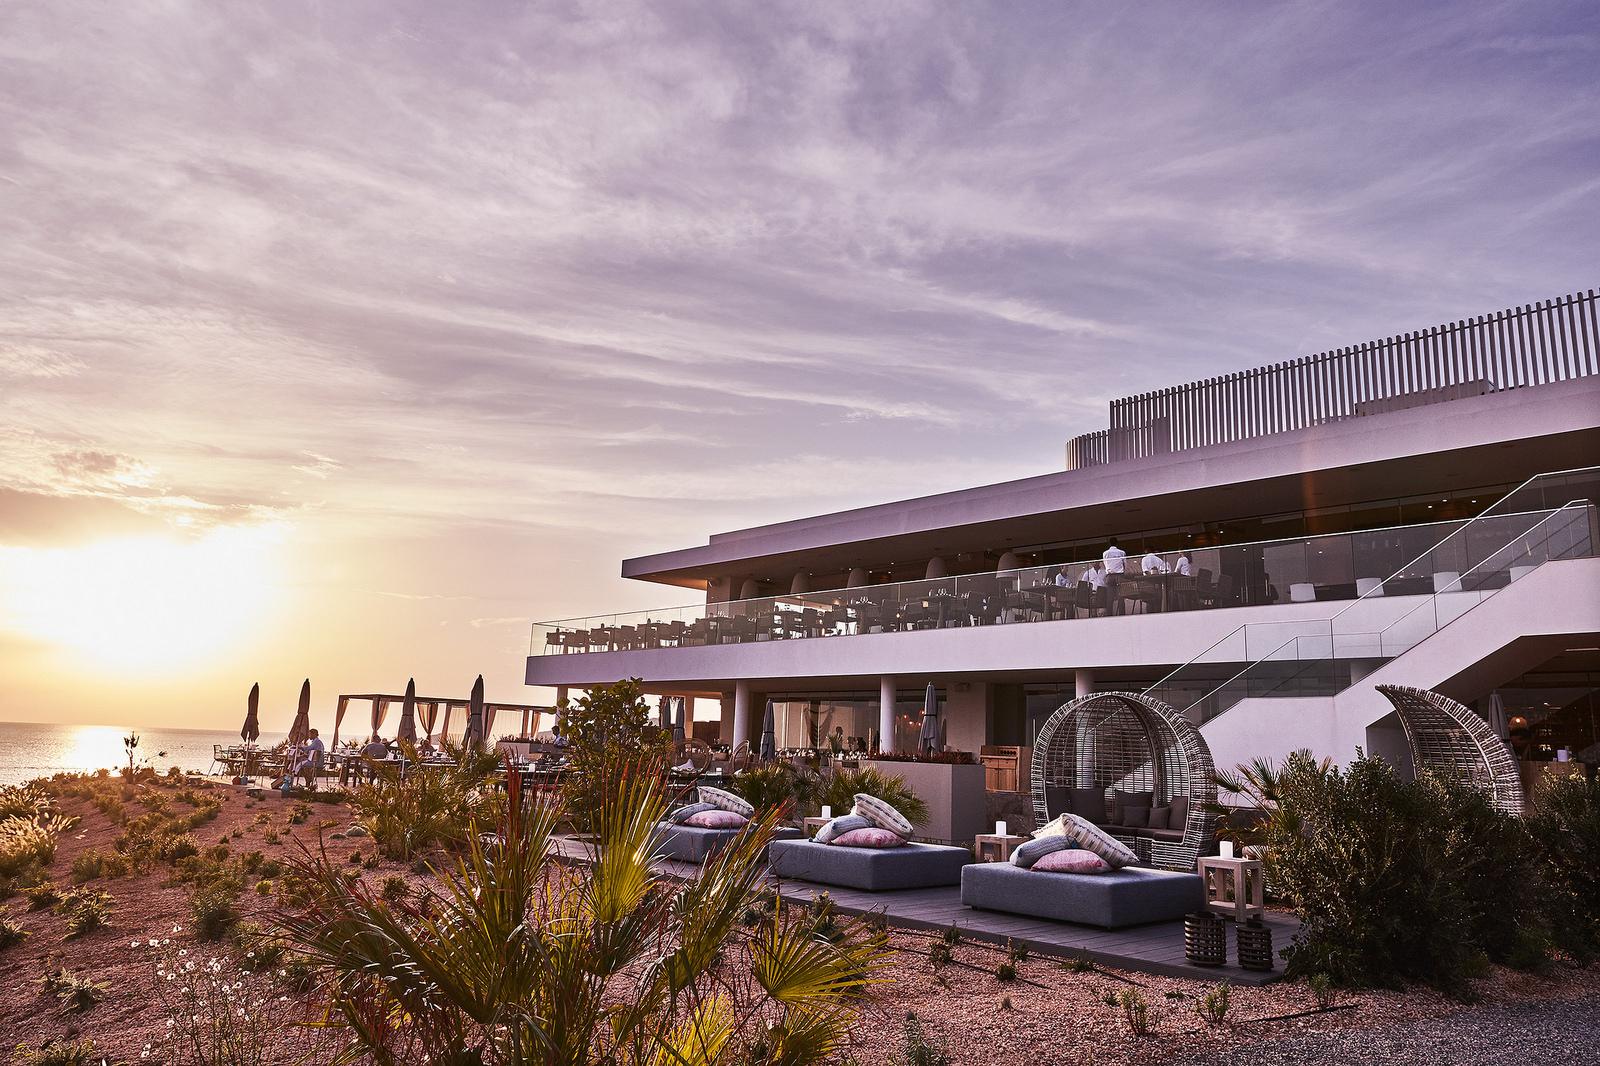 7Pines Kempinski Ibiza